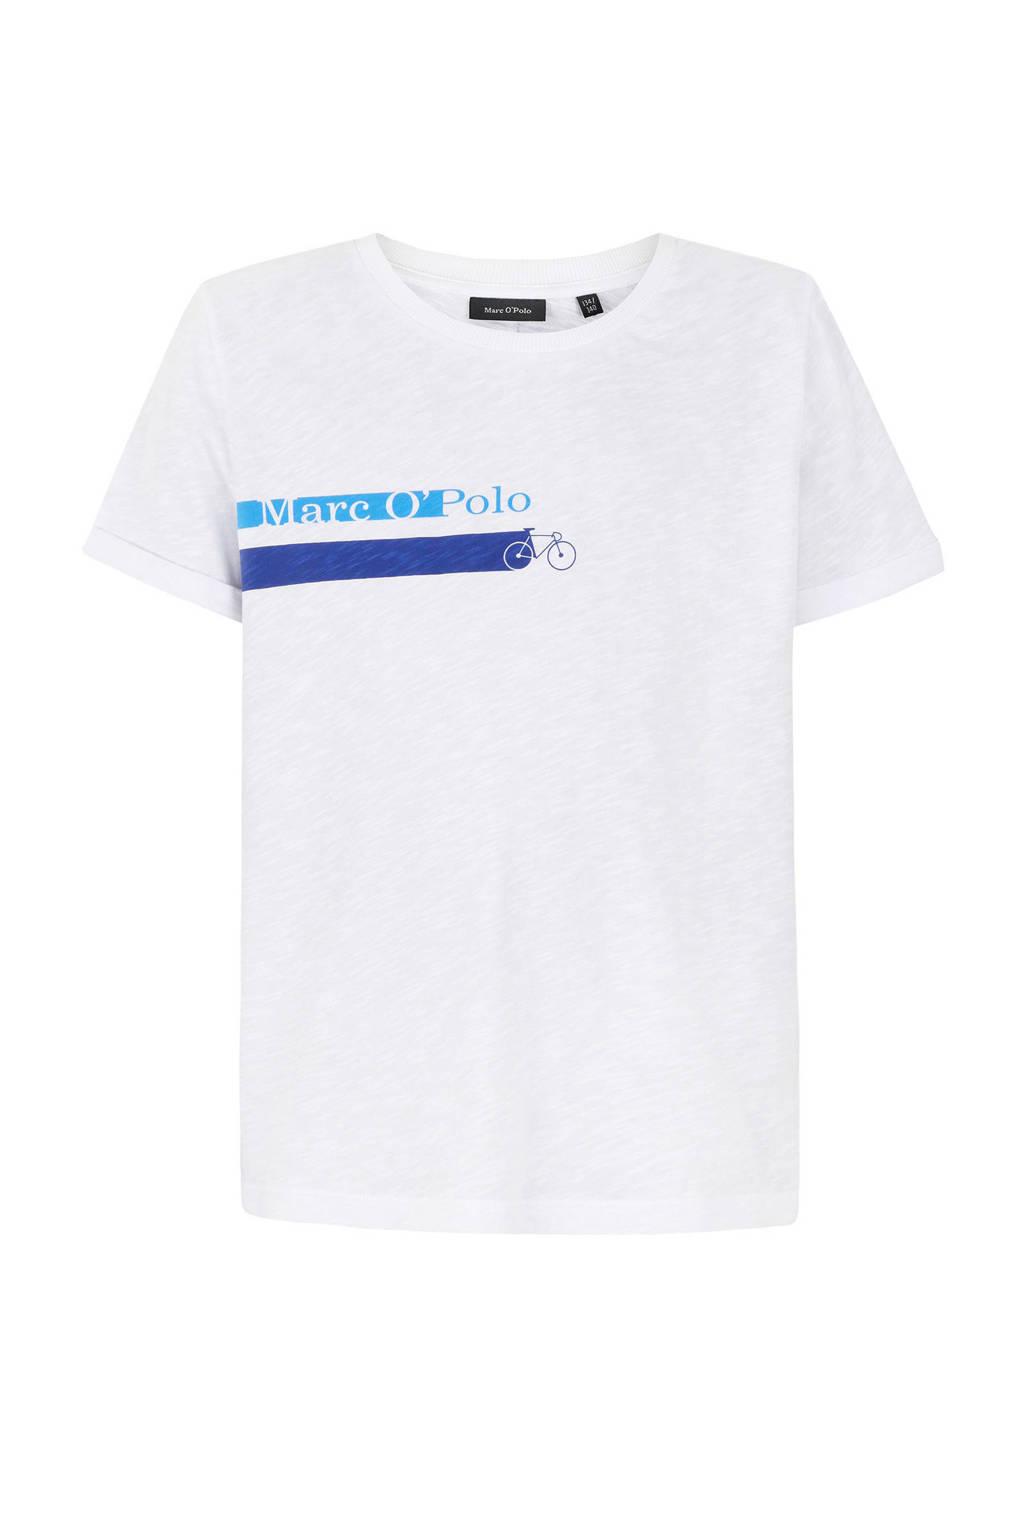 Marc O'Polo T-shirt met printopdruk wit, Wit